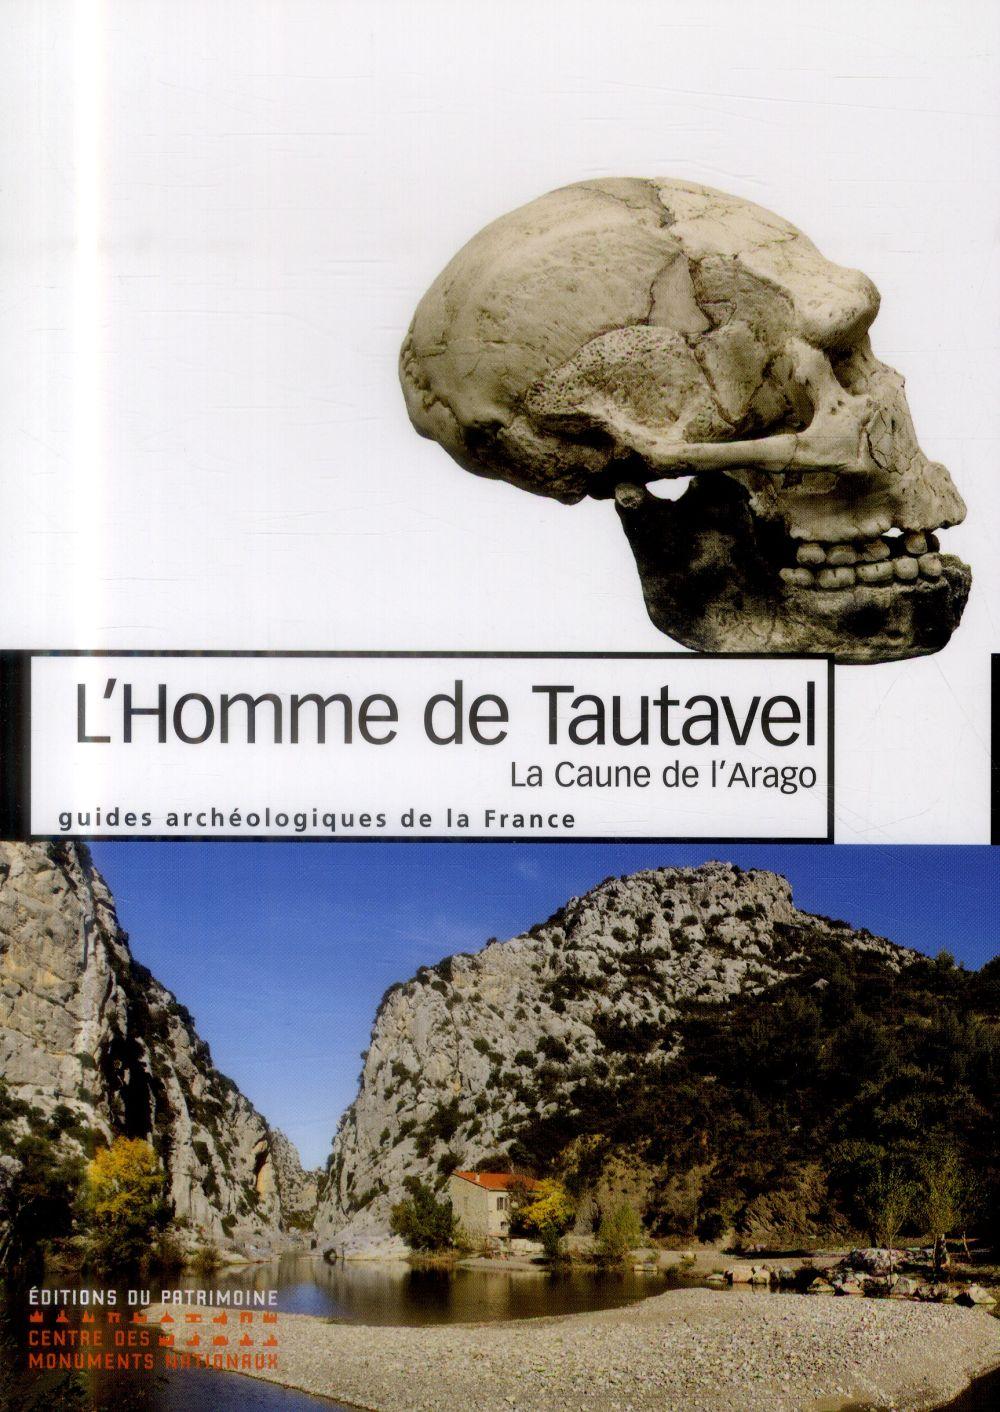 CAUNE DE L'ARAGO - HOMME DE TAUTAVEL